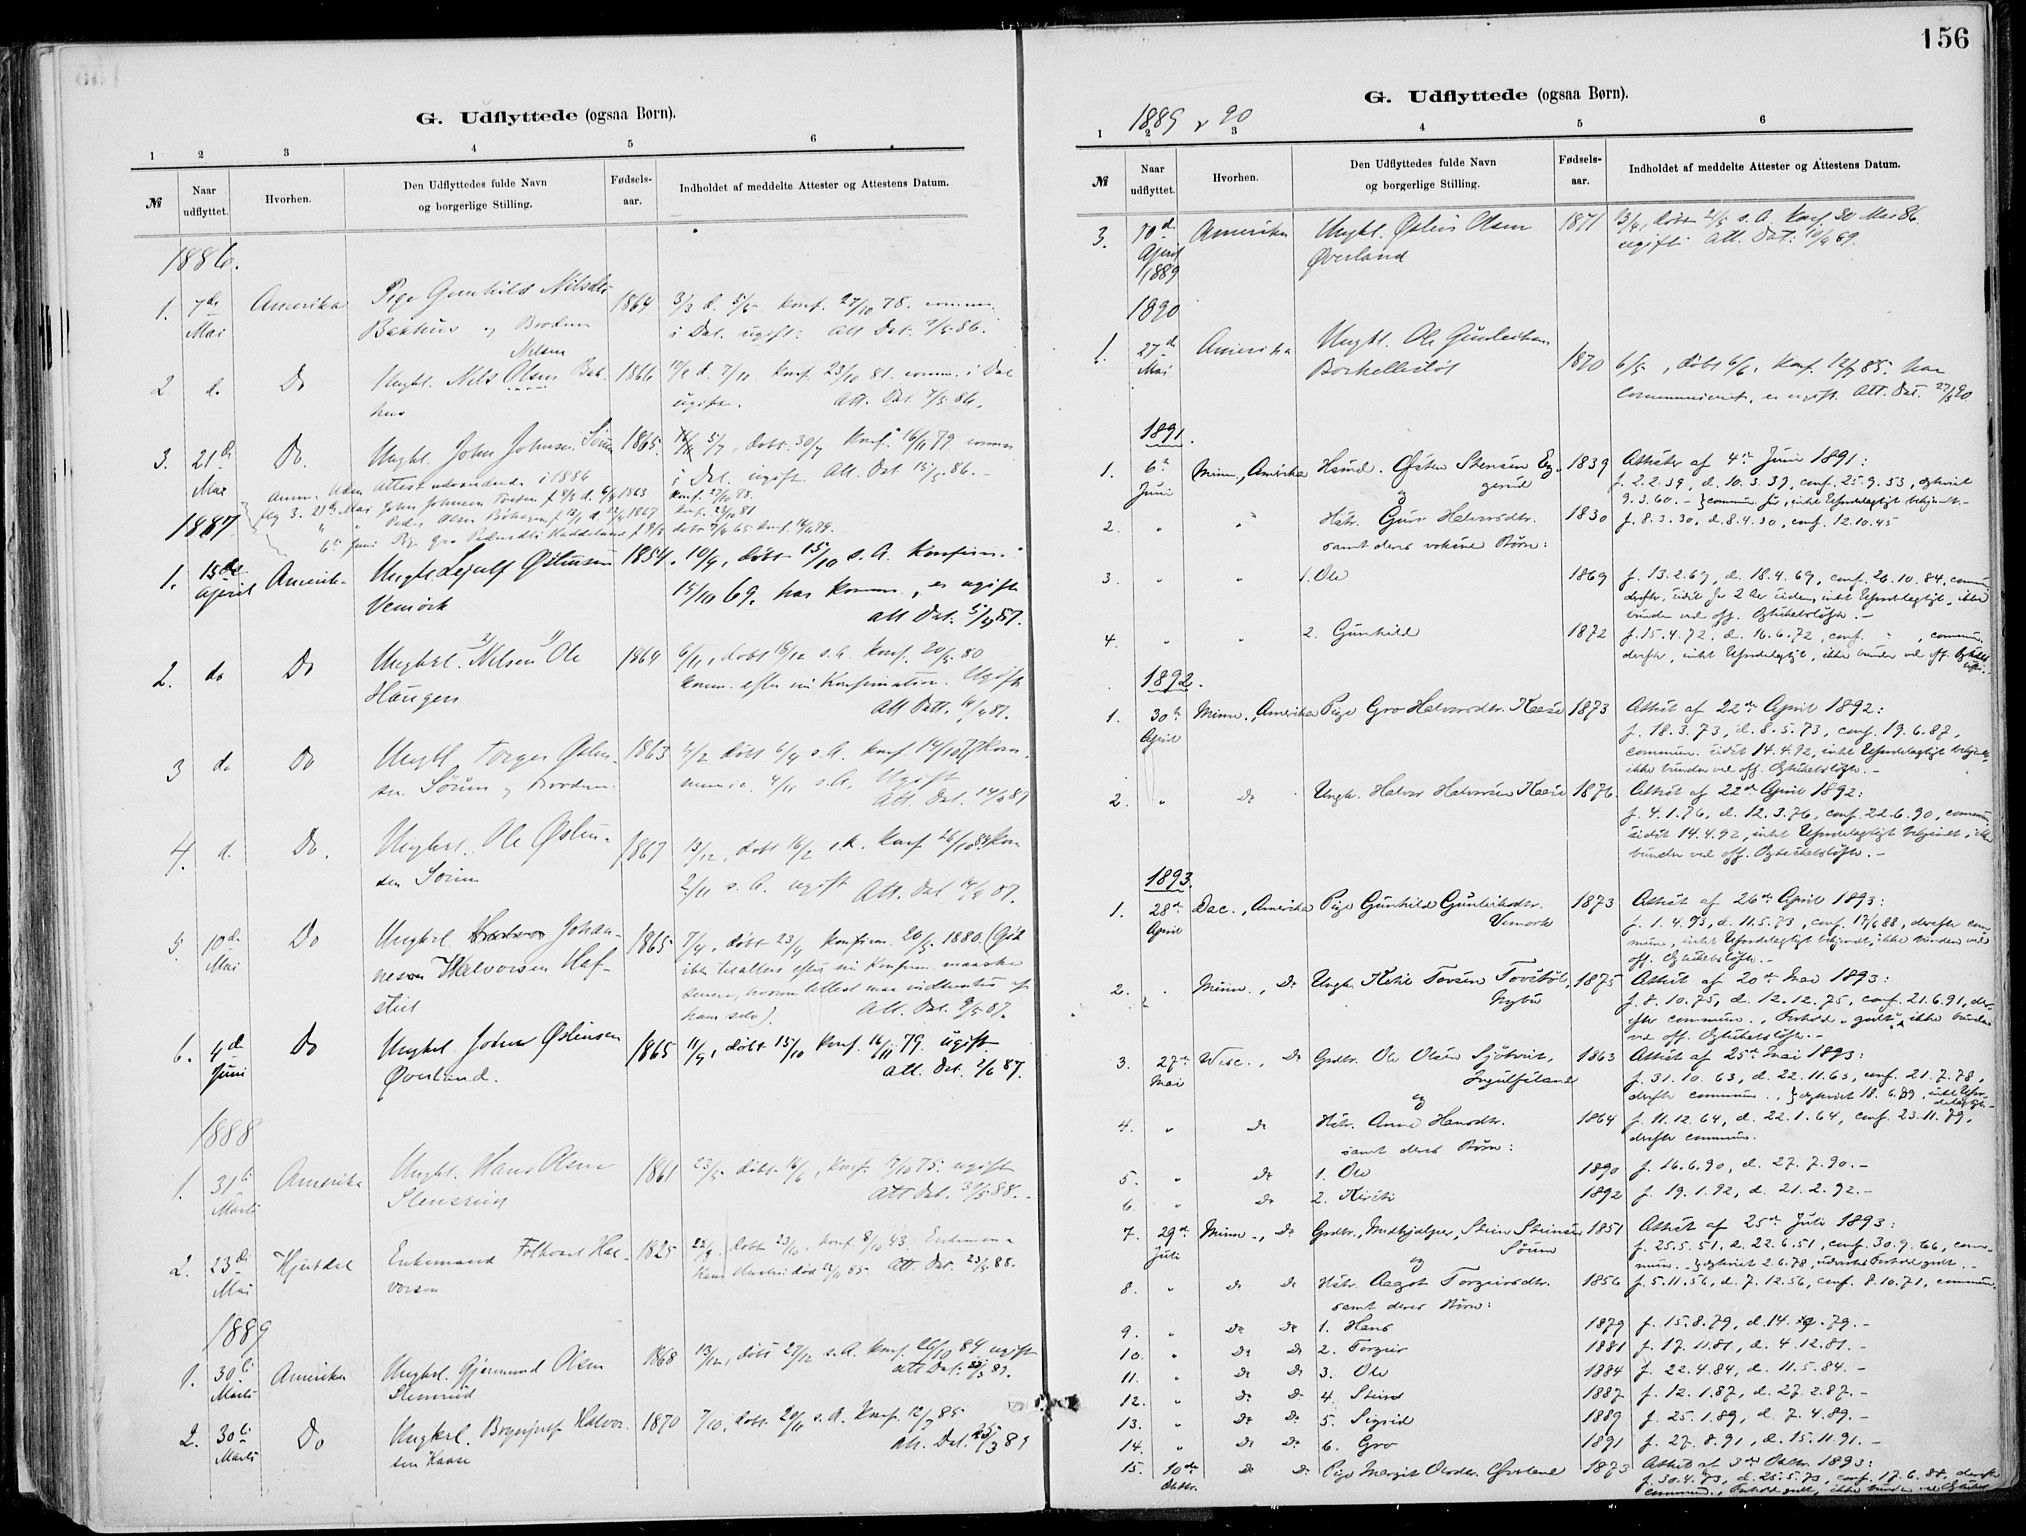 SAKO, Rjukan kirkebøker, F/Fa/L0001: Ministerialbok nr. 1, 1878-1912, s. 156